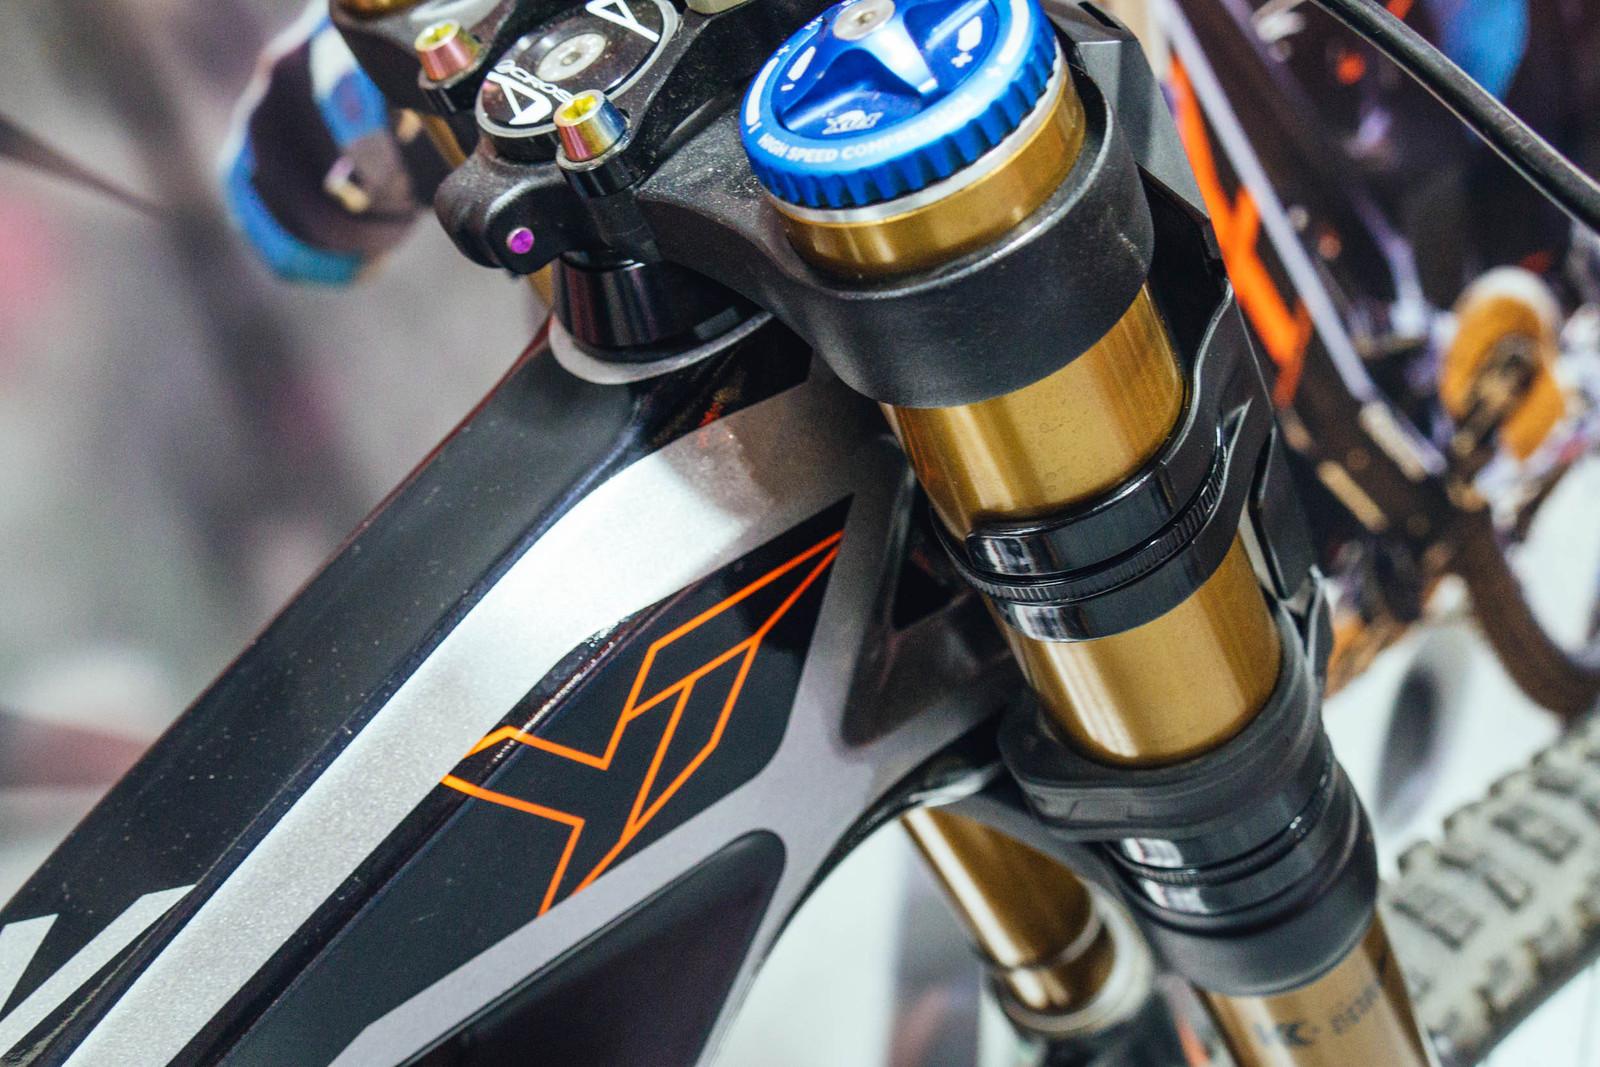 ODI Hucker BMX Scooter MTB Bike Grips